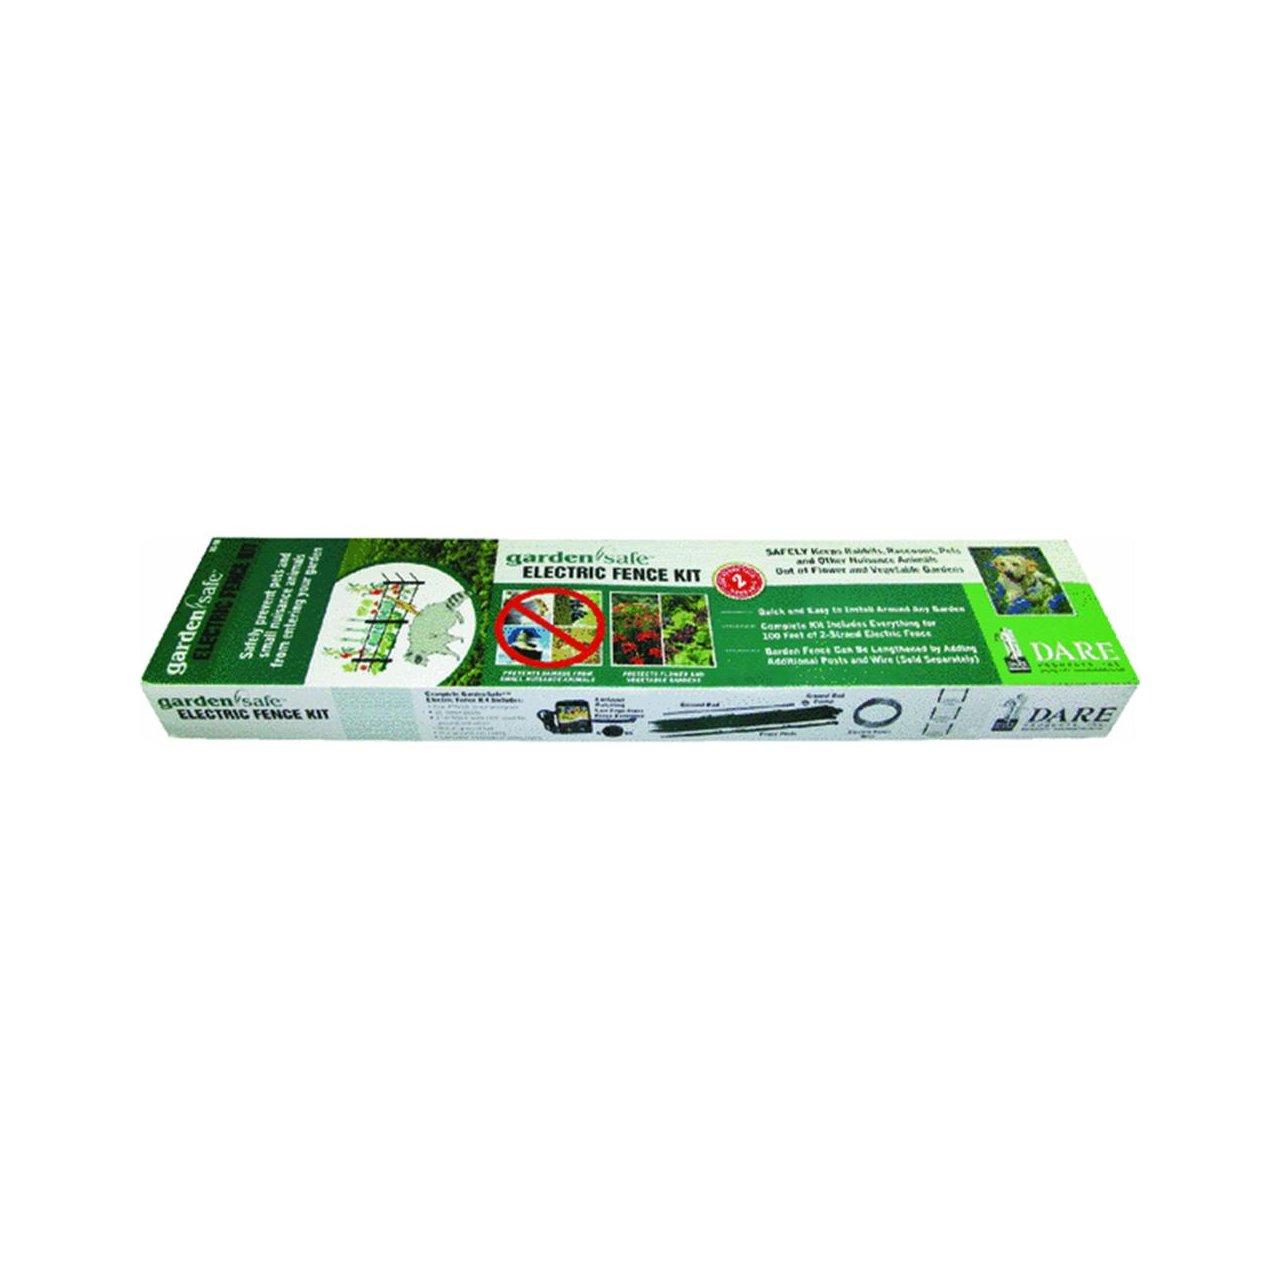 Dare DE GK 20 Electric Fence Garden Kit-Quantity 2